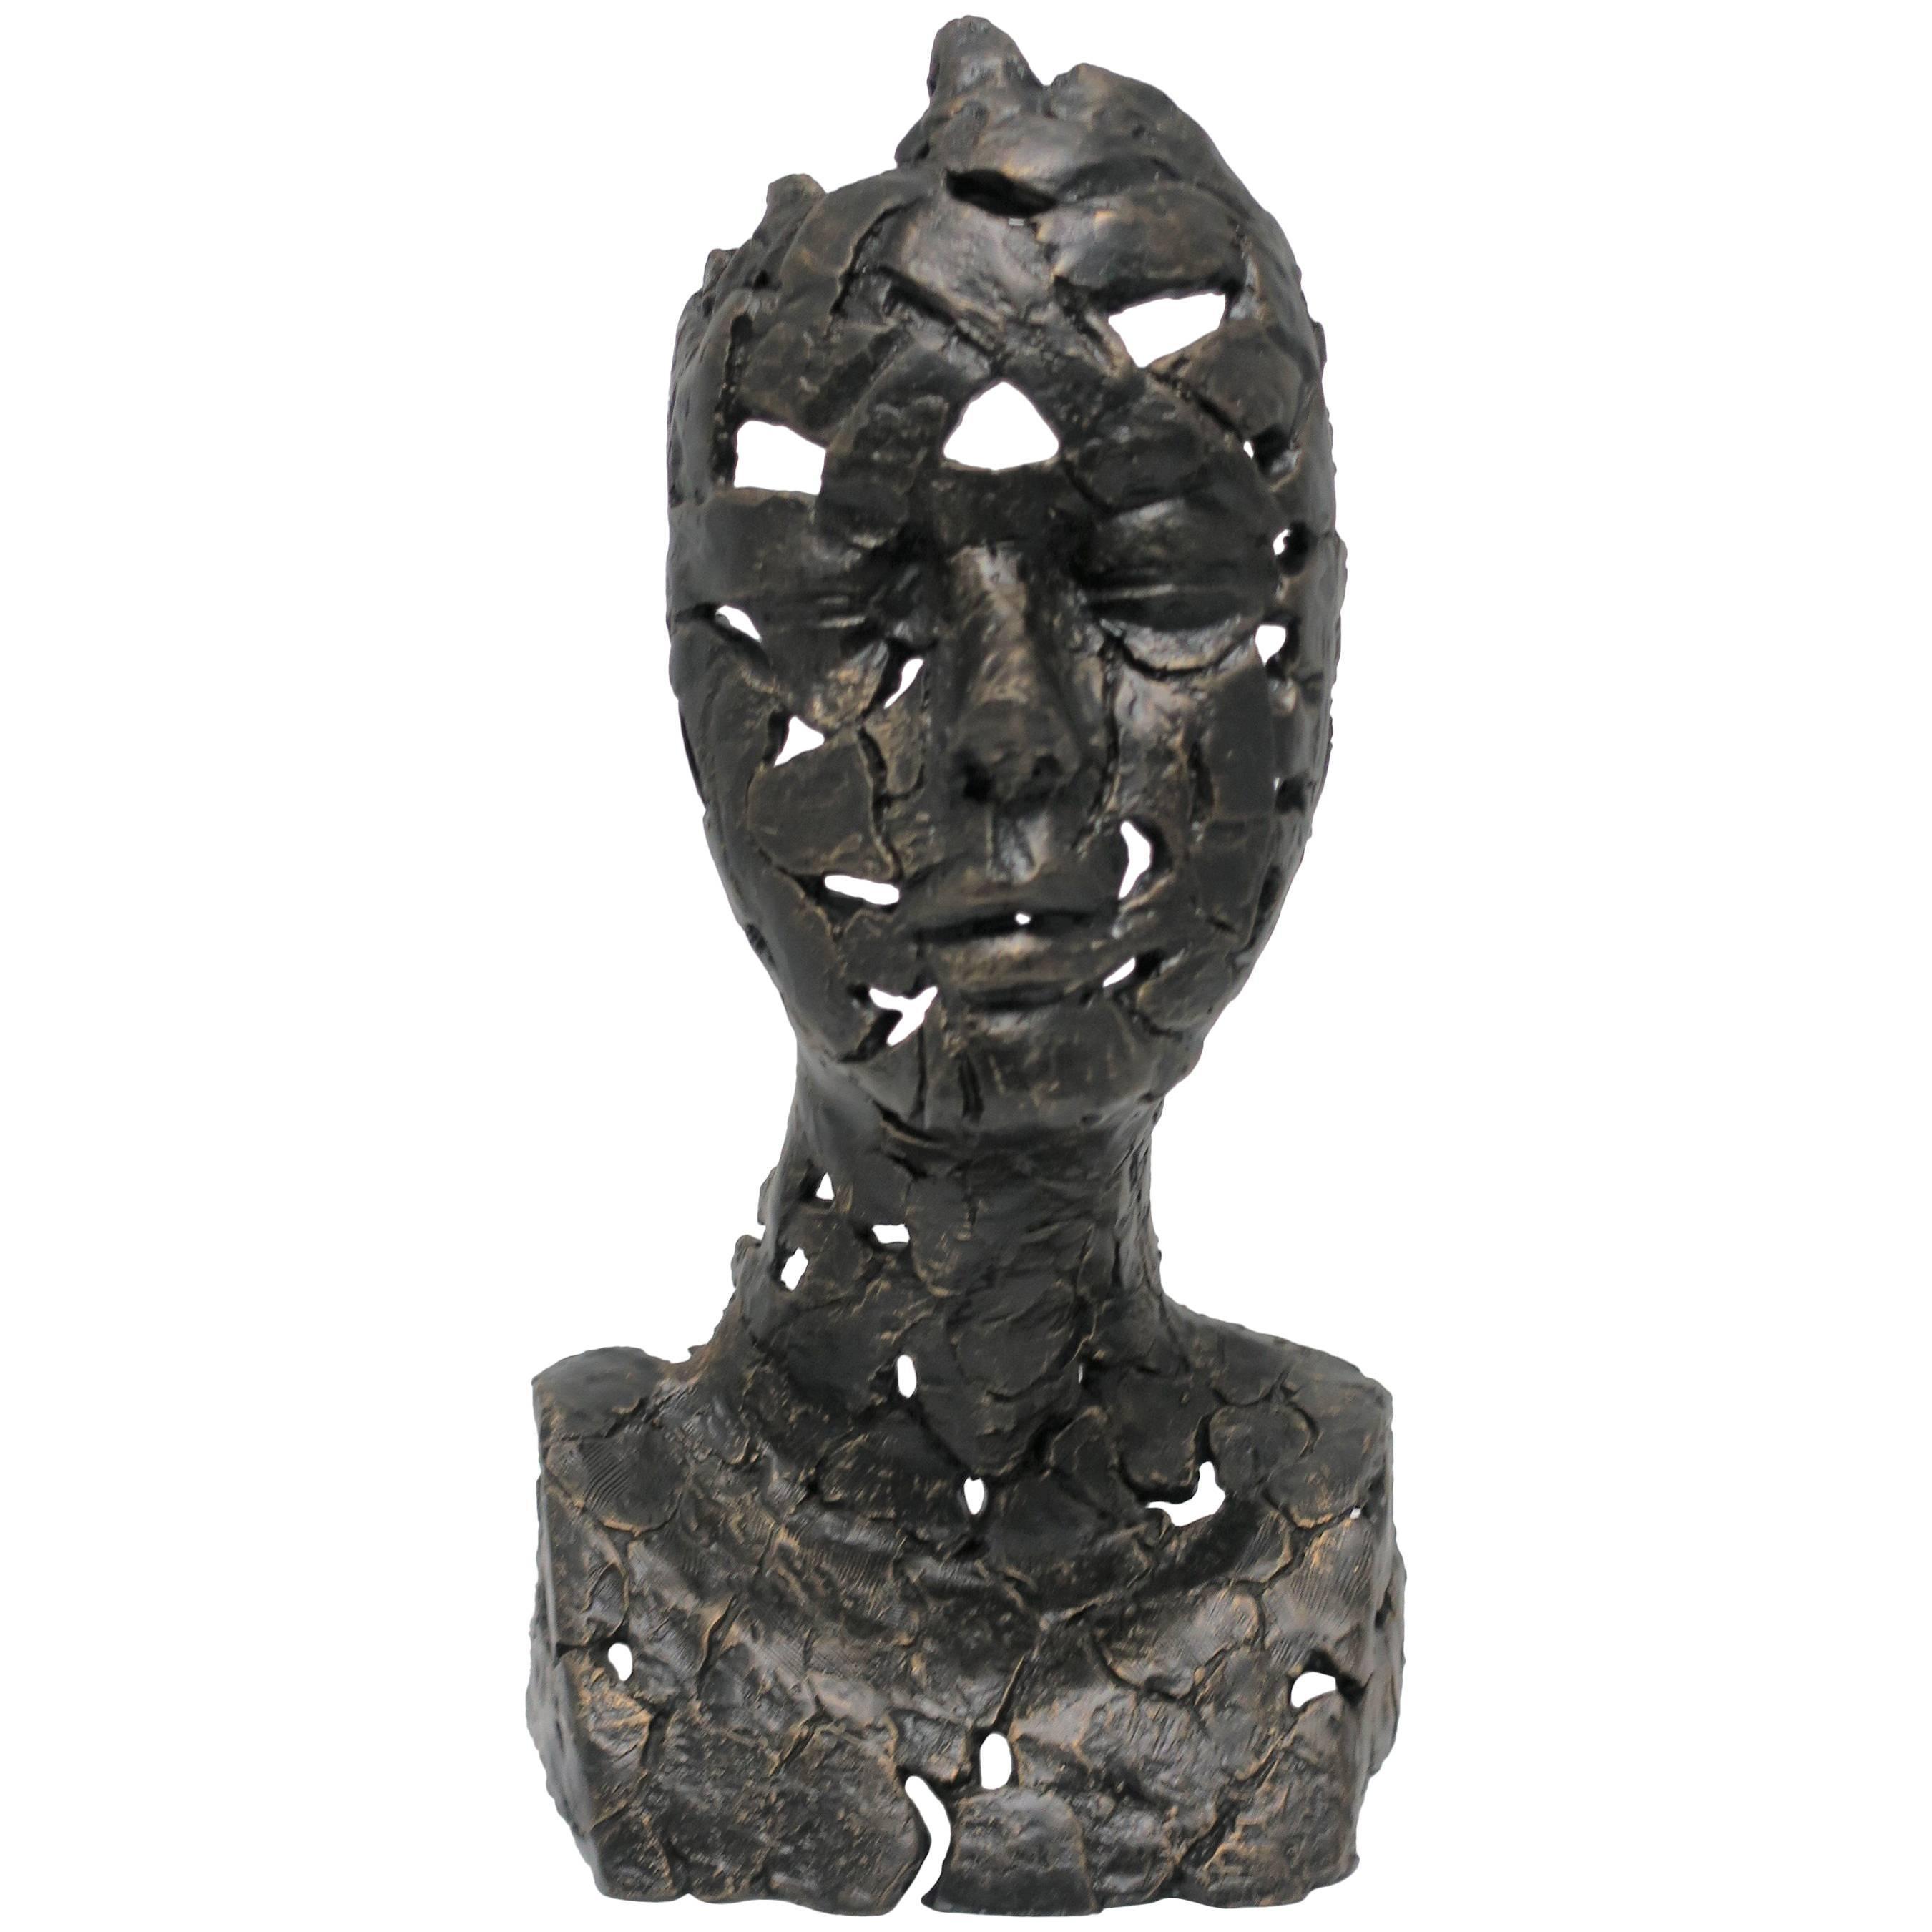 Bronzed Female Bust Sculpture